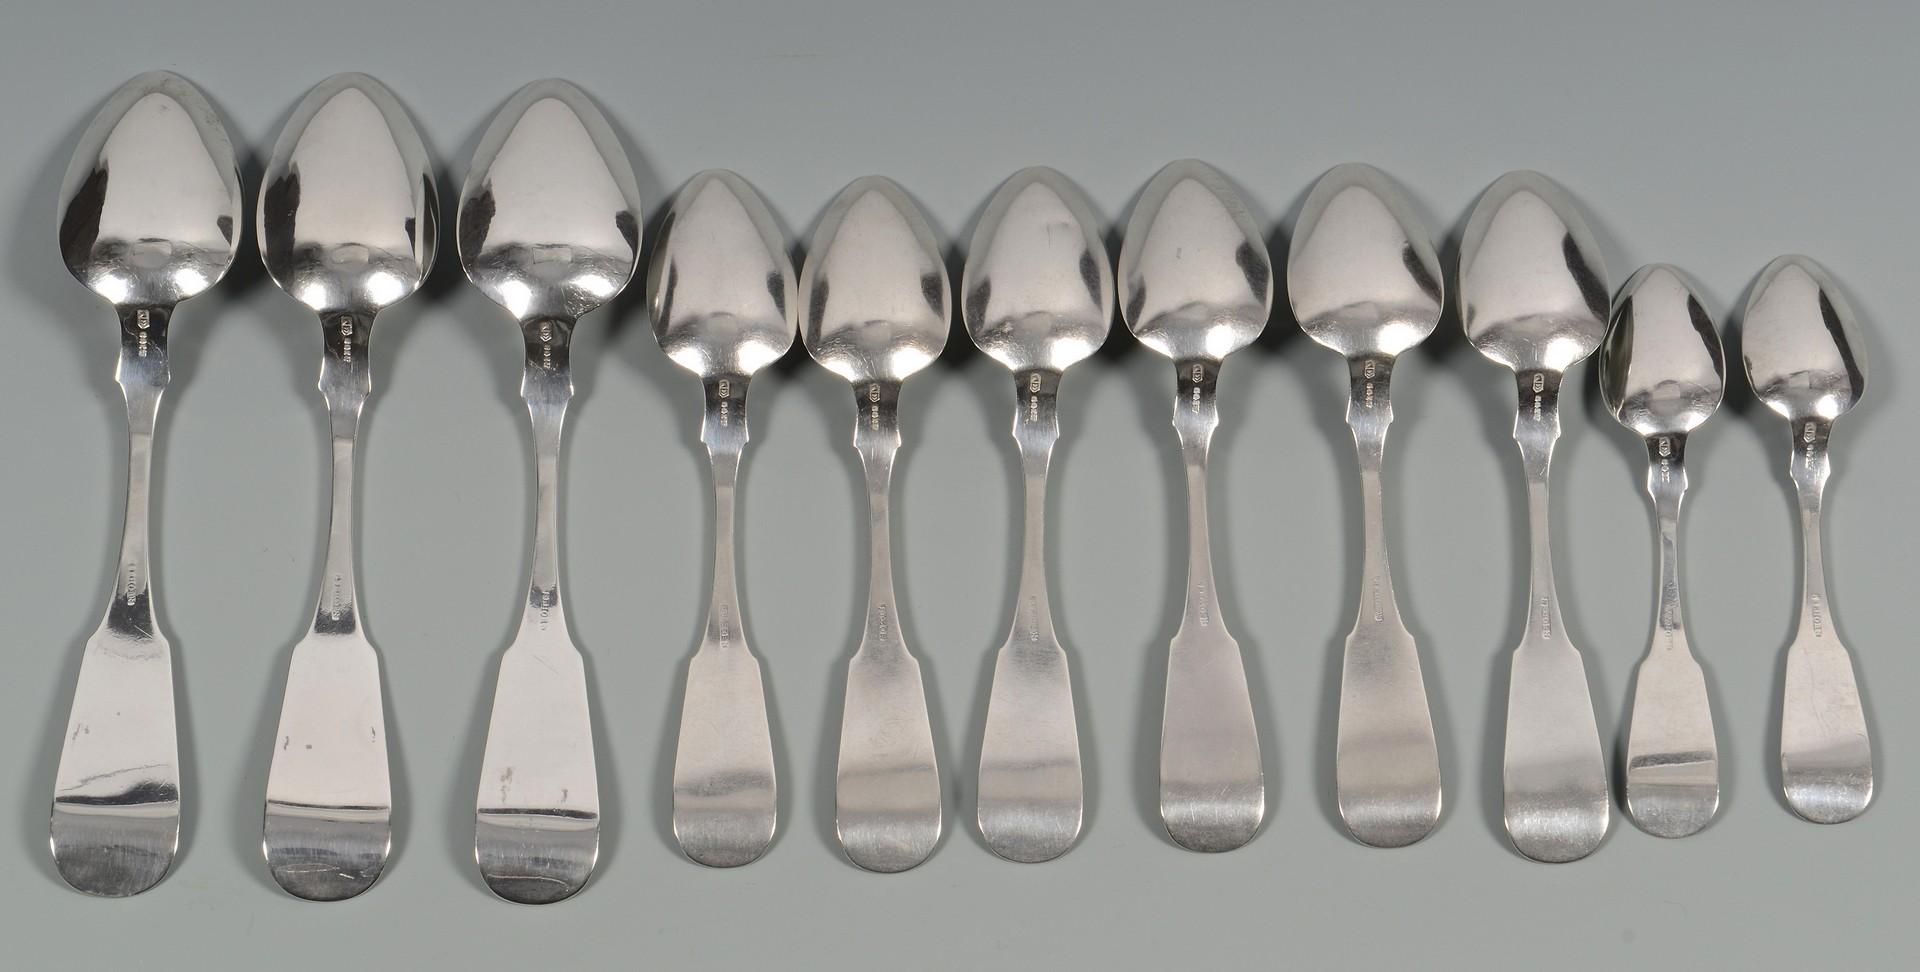 Lot 57: 11 Sehorn TN Coin Silver Spoons